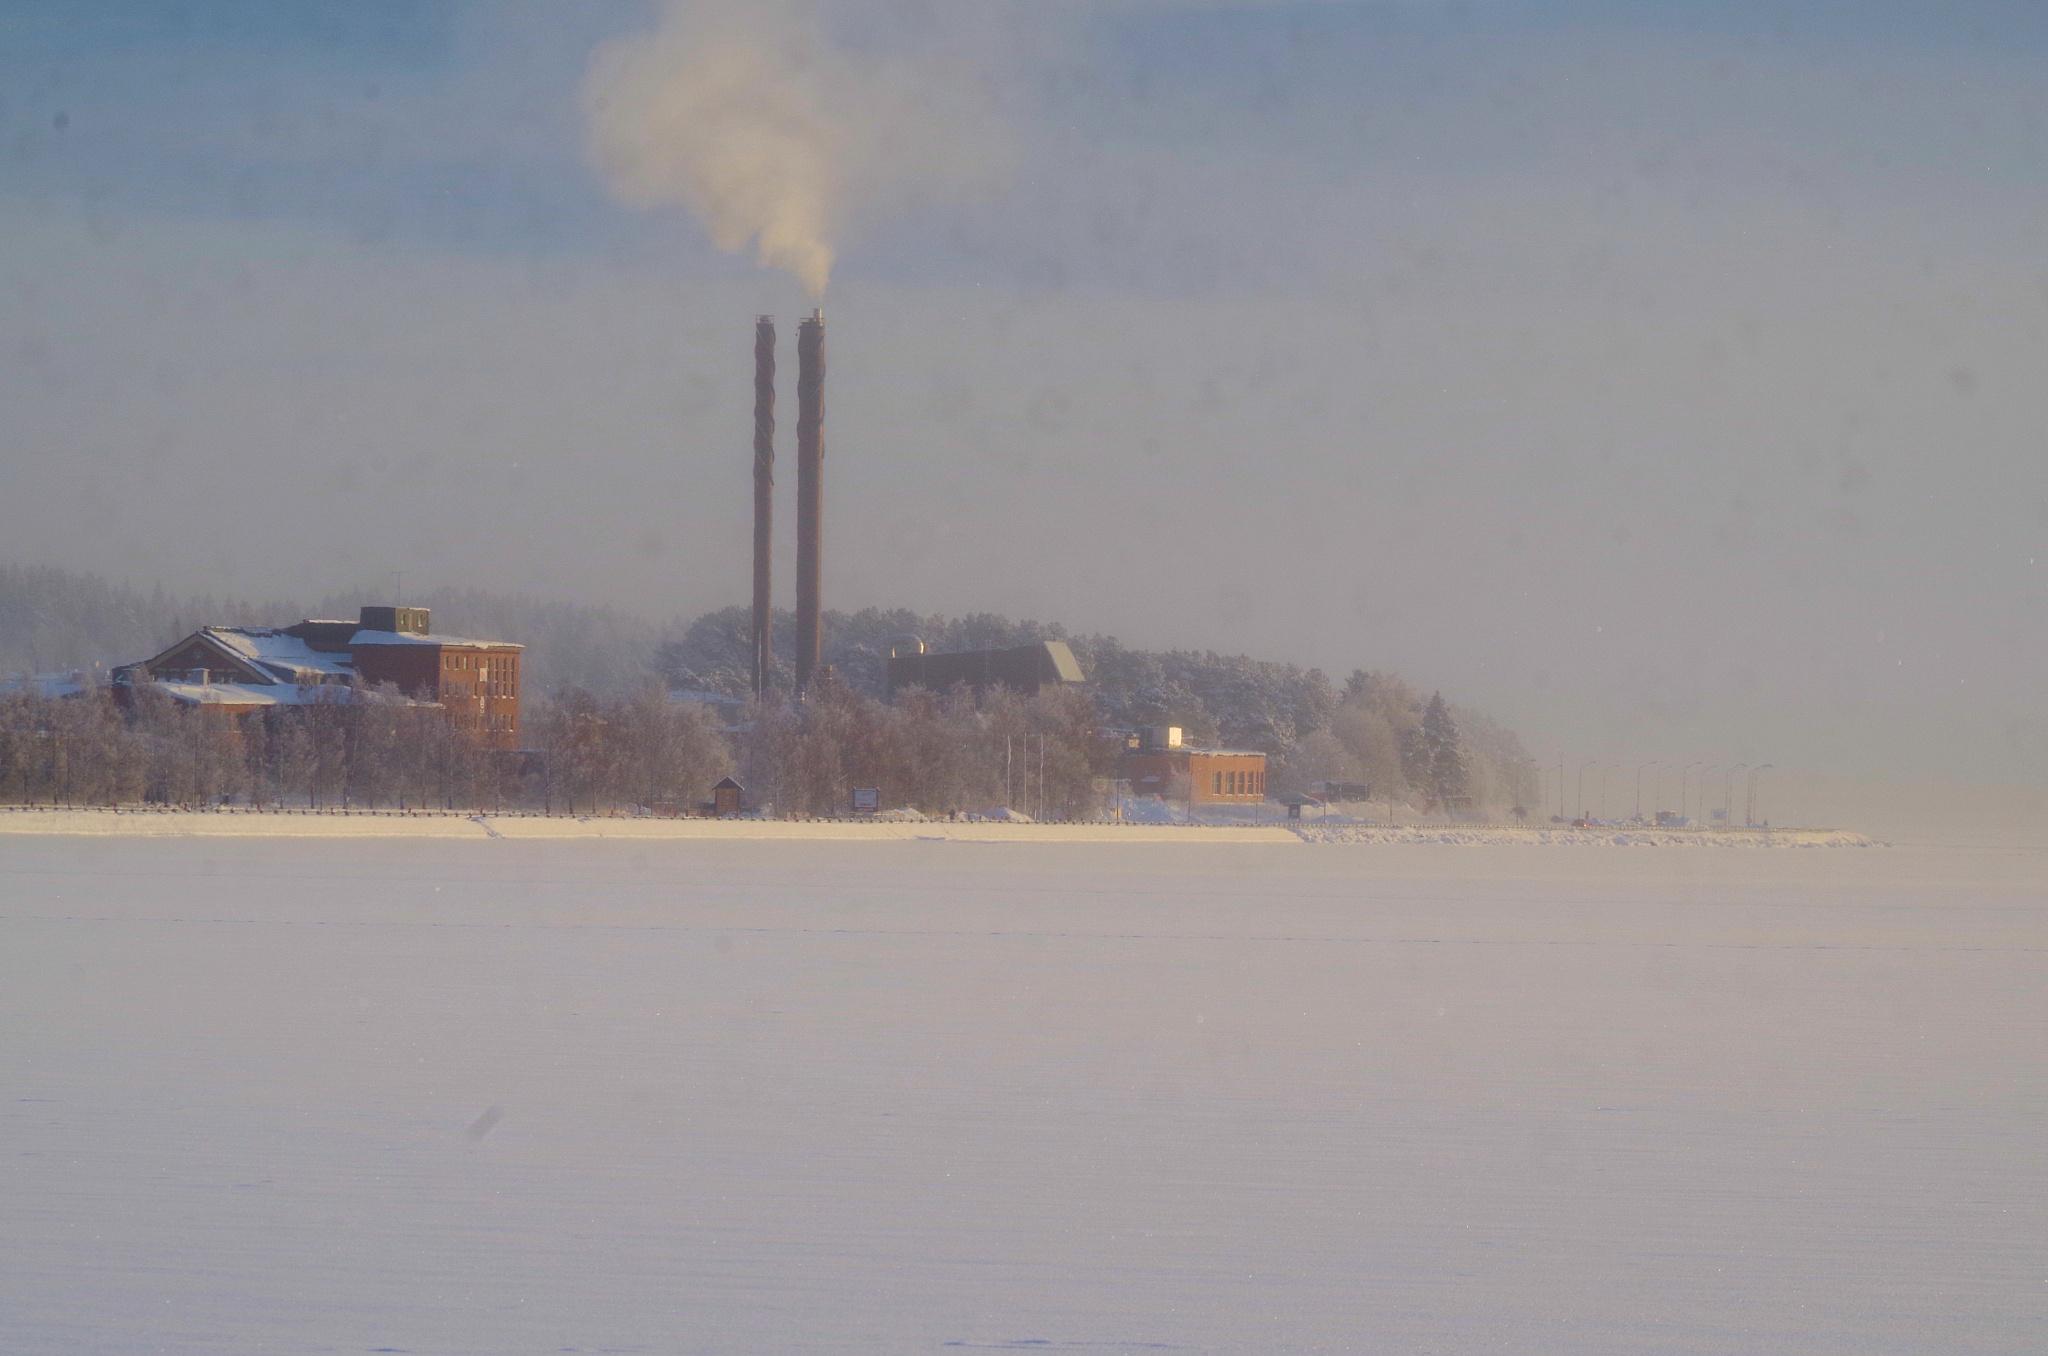 From Östersund, Sweden by lundhanders